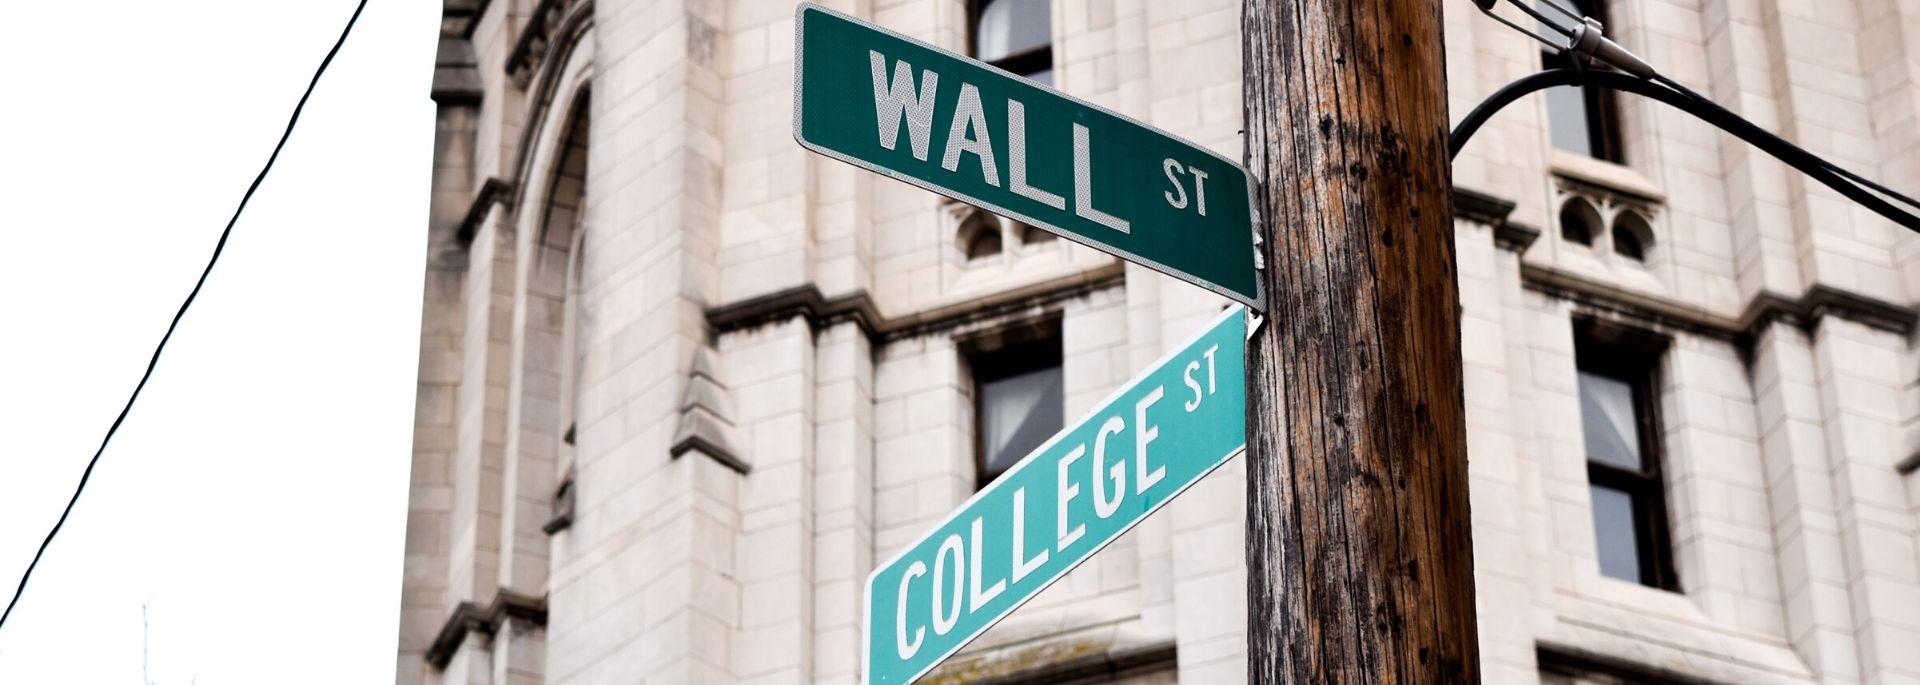 Taller de Introducción a la Bolsa – Nivel I